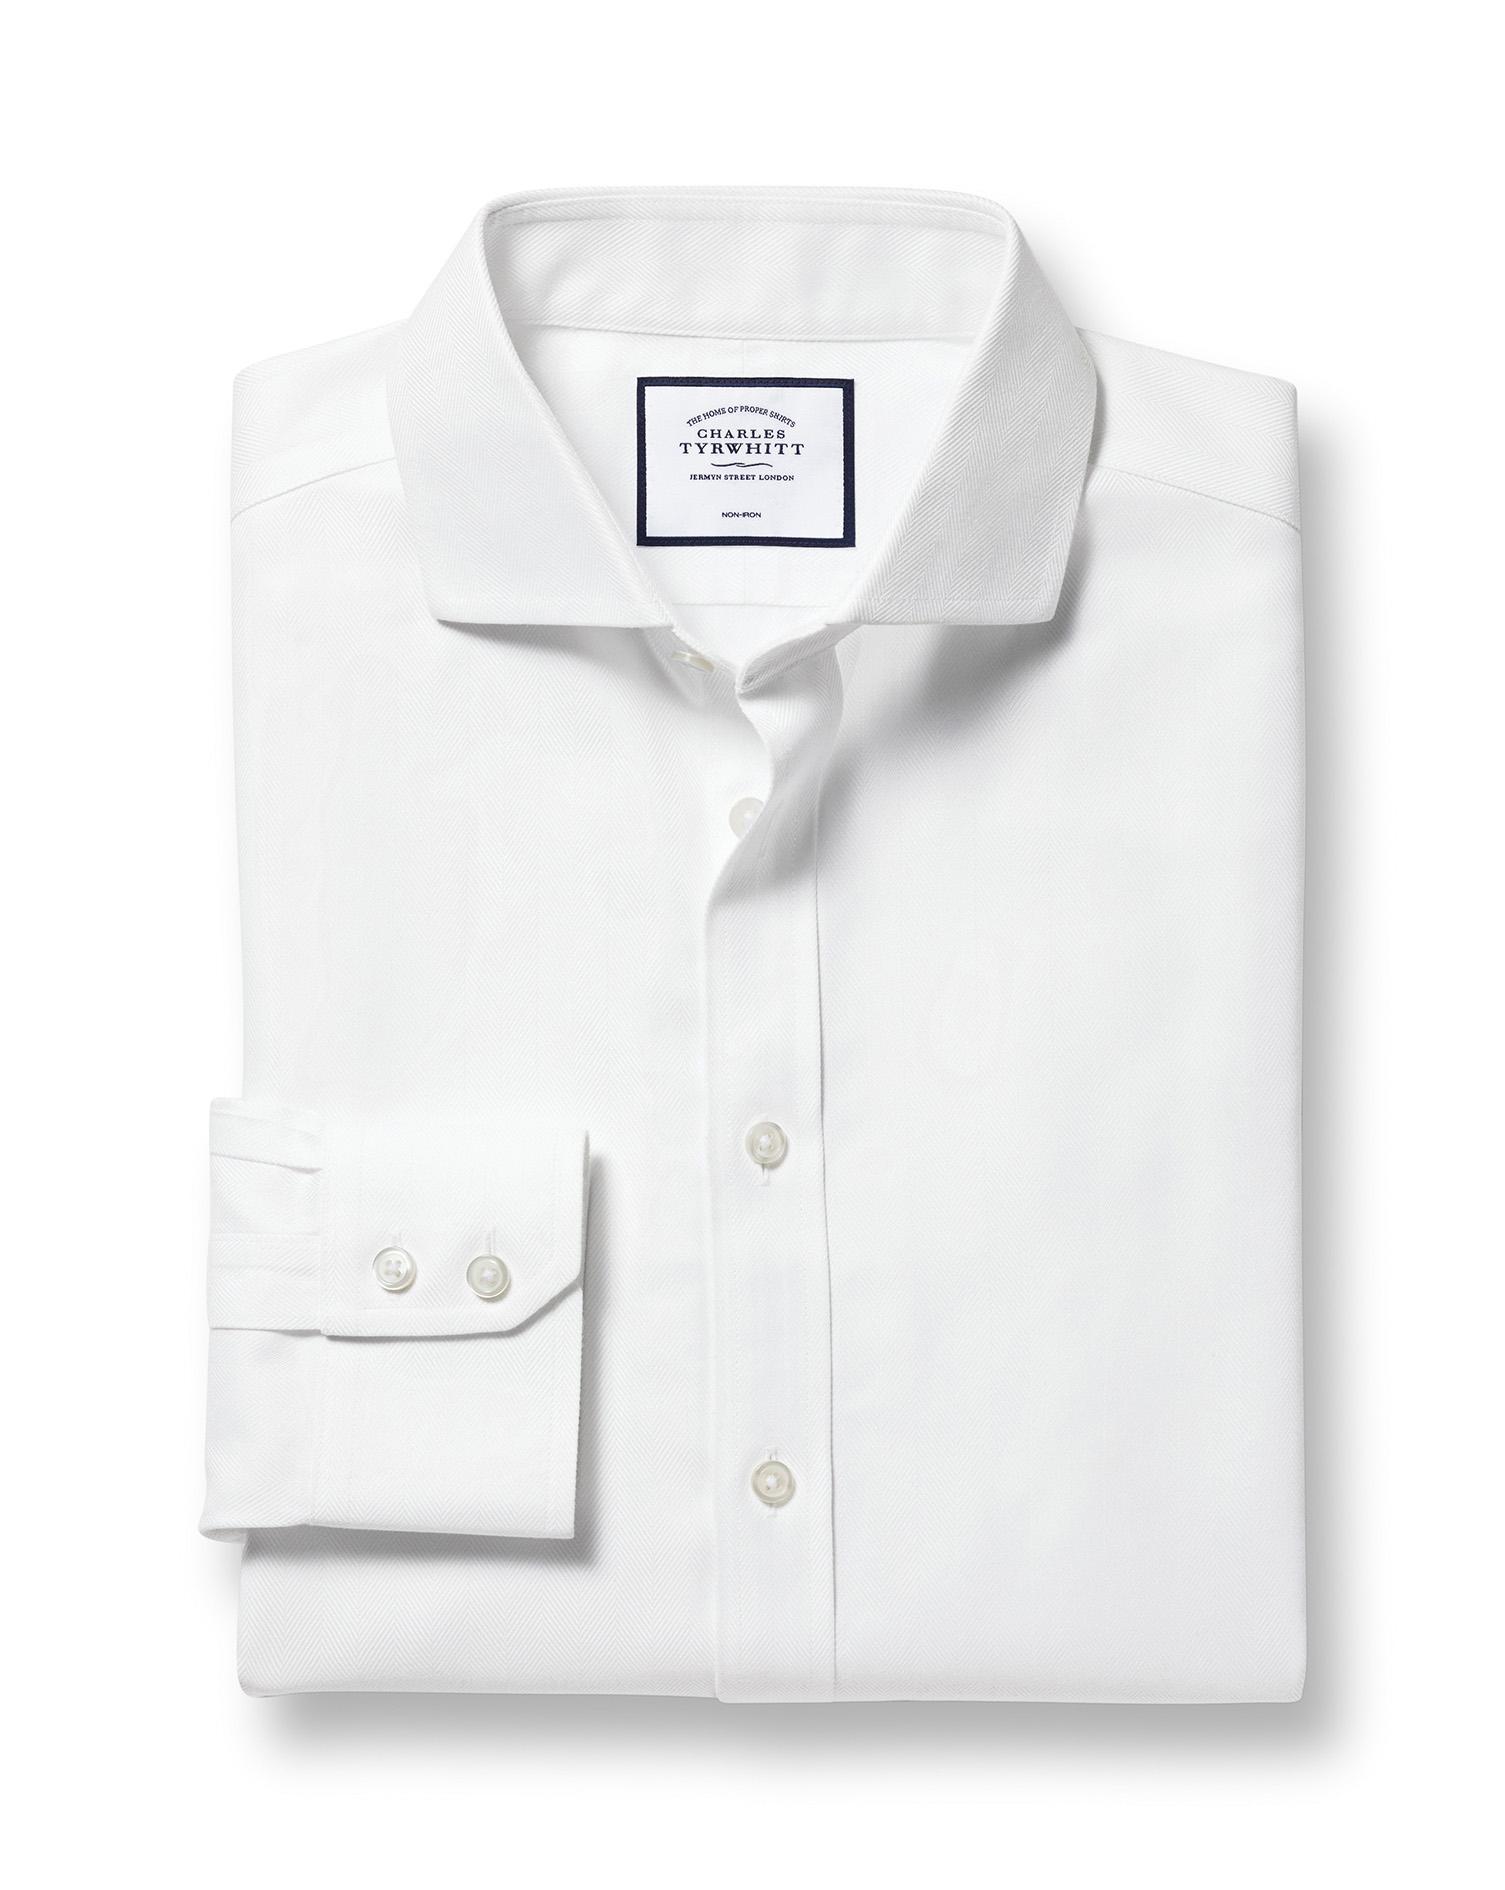 Slim Fit Non-Iron White Herringbone Cotton Formal Shirt Single Cuff Size 16/34 by Charles Tyrwhitt